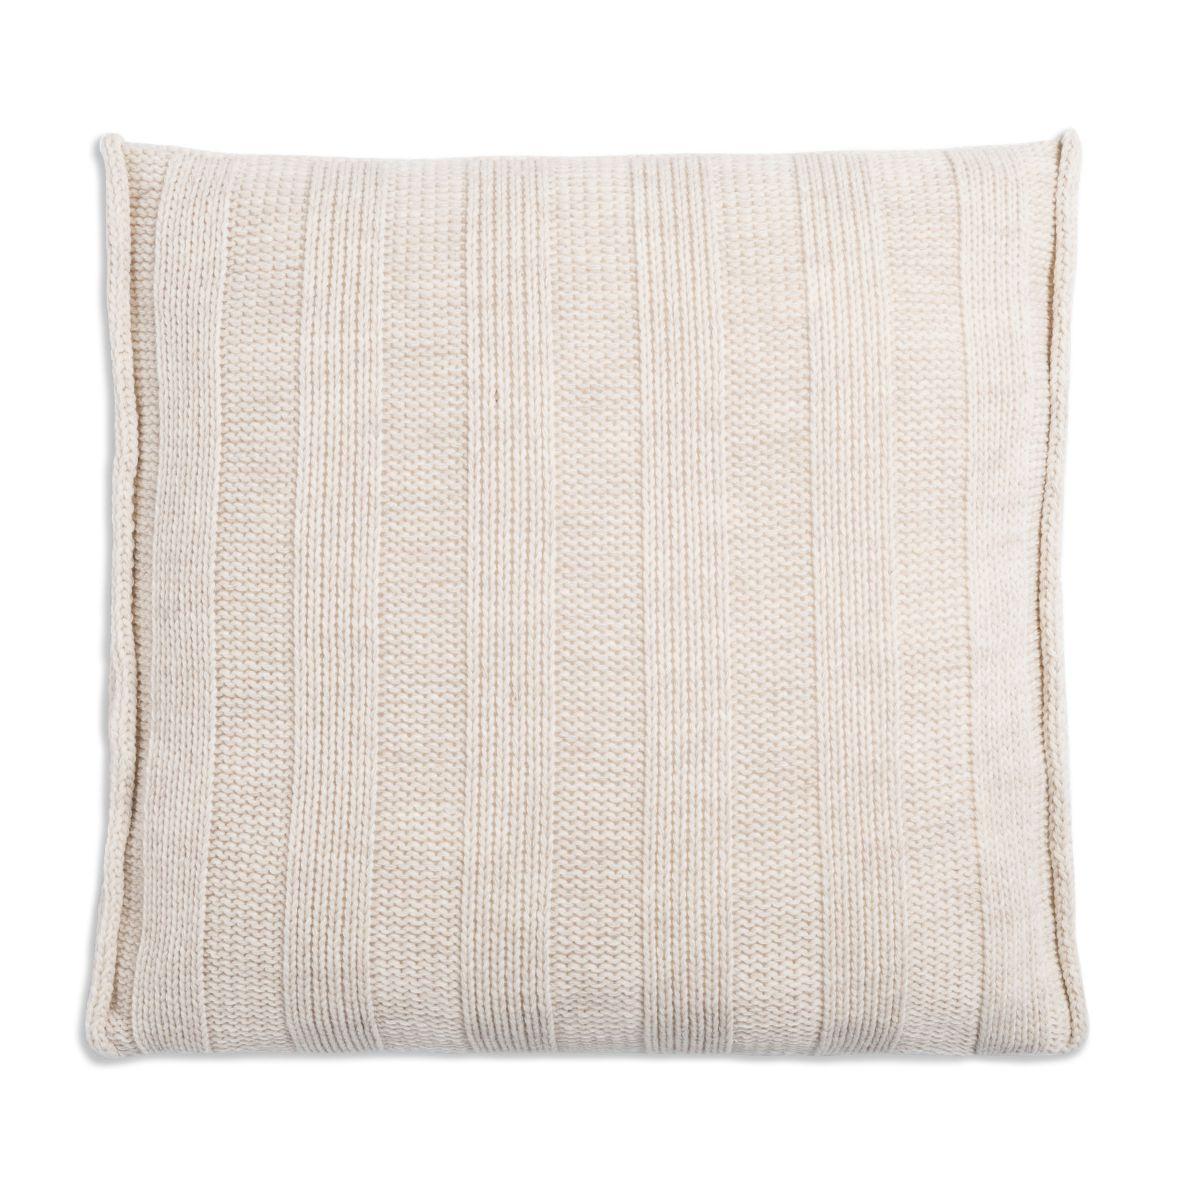 jesse cushion beige 50x50